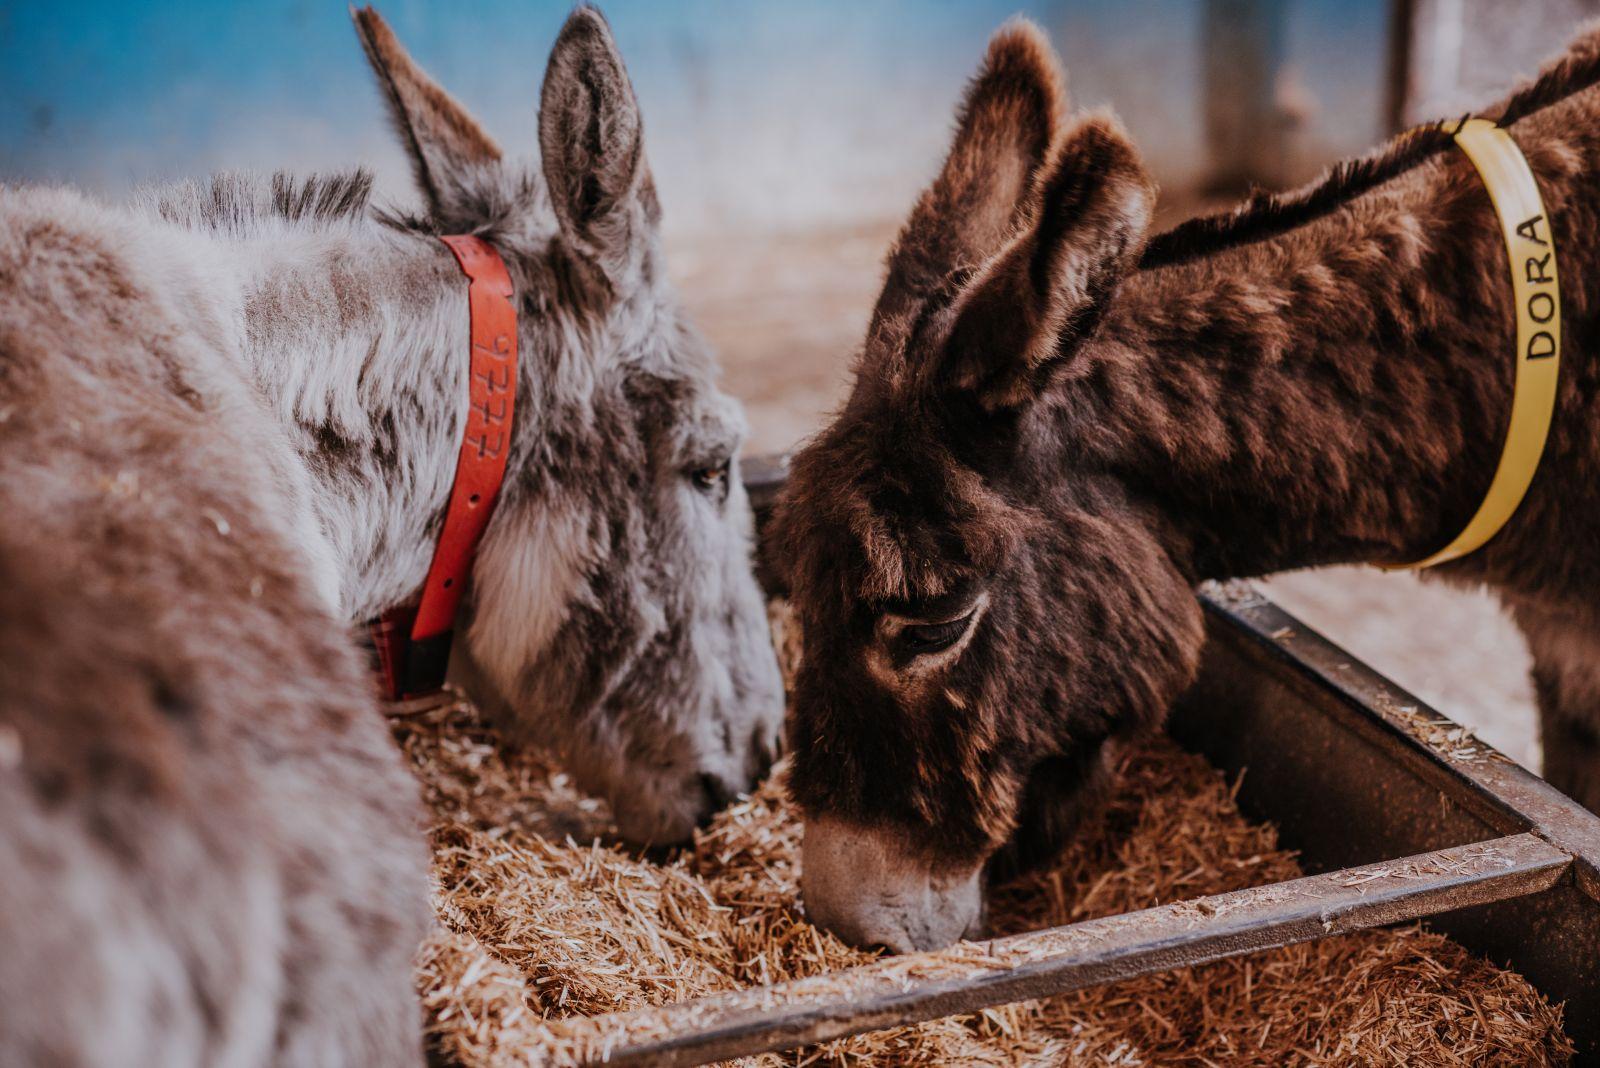 Voeding voor ezels Donkey Sanctuary